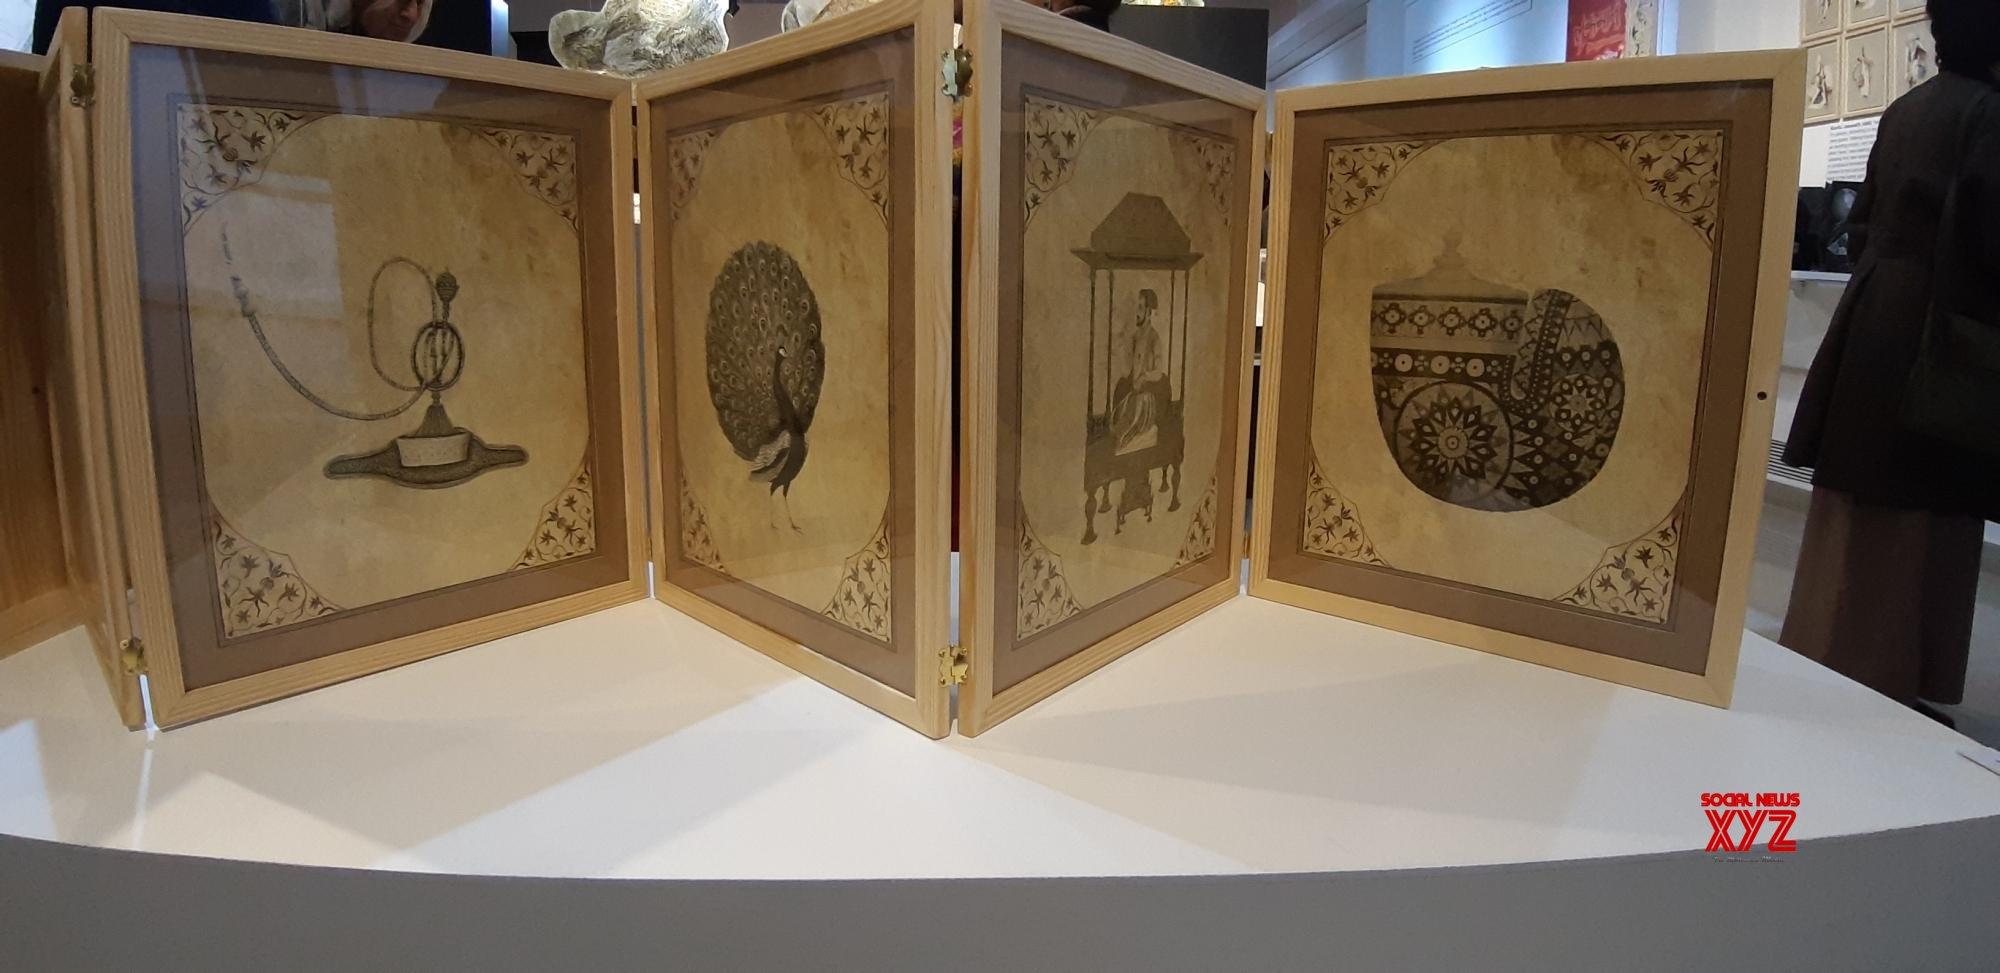 File Photos: Books as art objects: Artists' book exhibition explores unique genre #Gallery